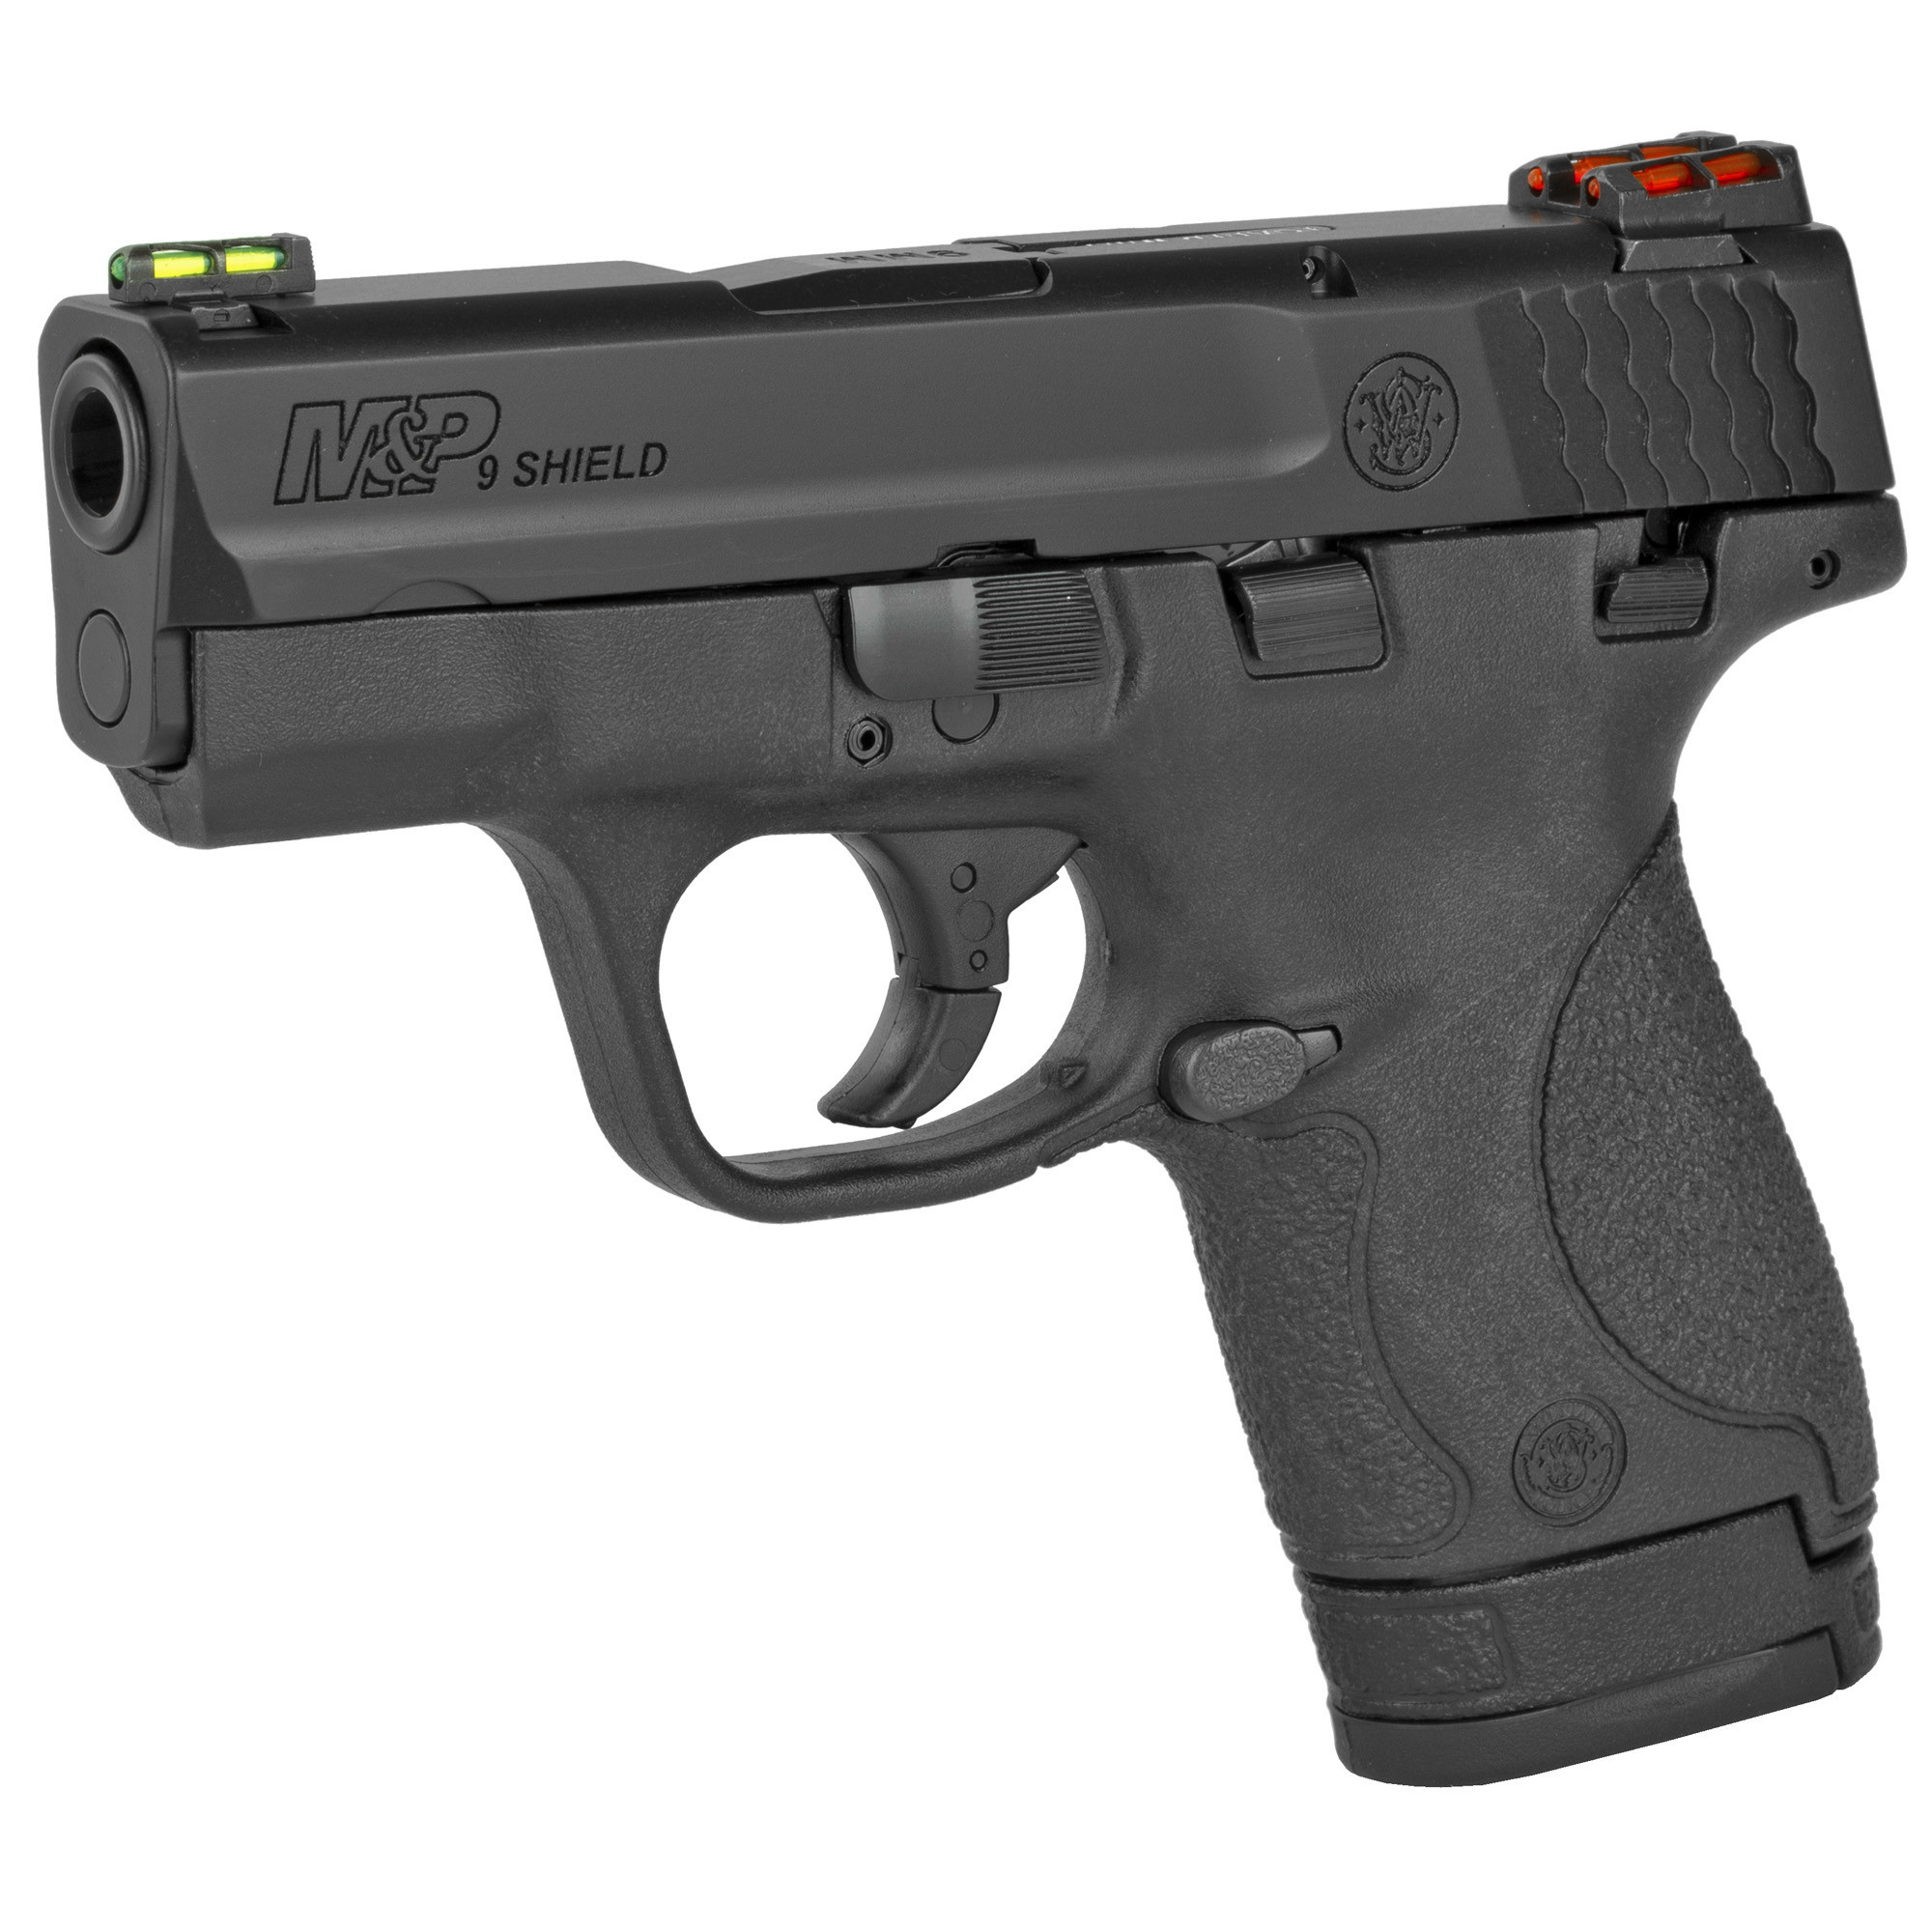 Smith & Wesson M&P9 Shield Pistol 9MM HI-VIZ